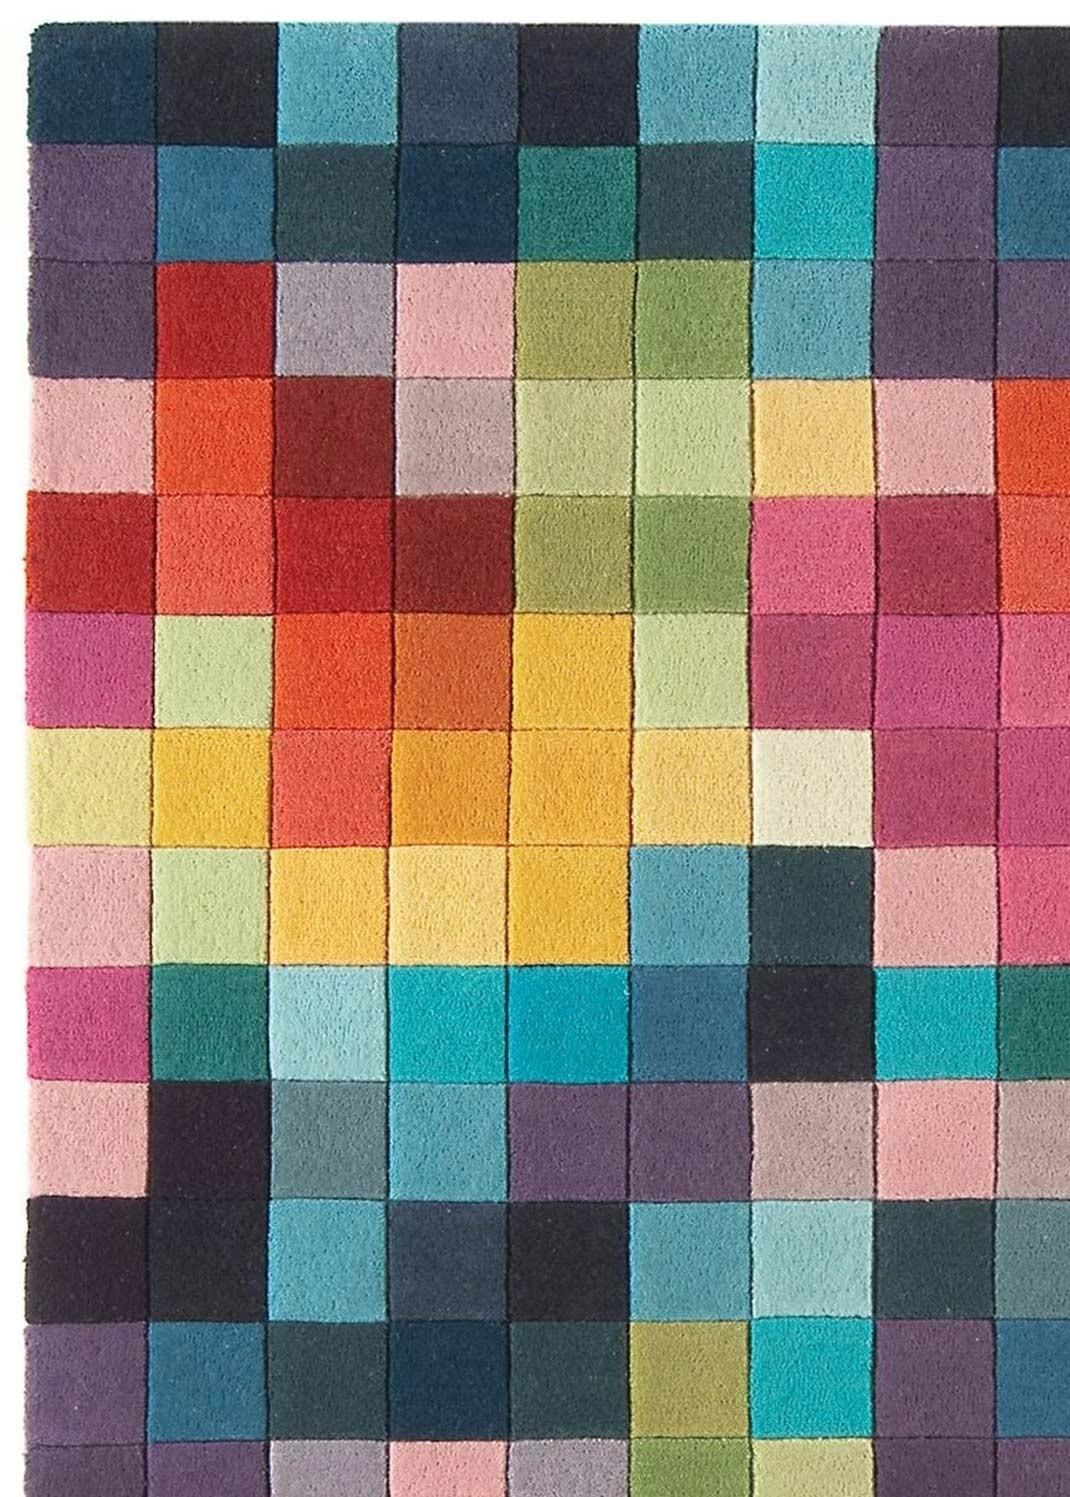 Tetra rug - Multiboxes